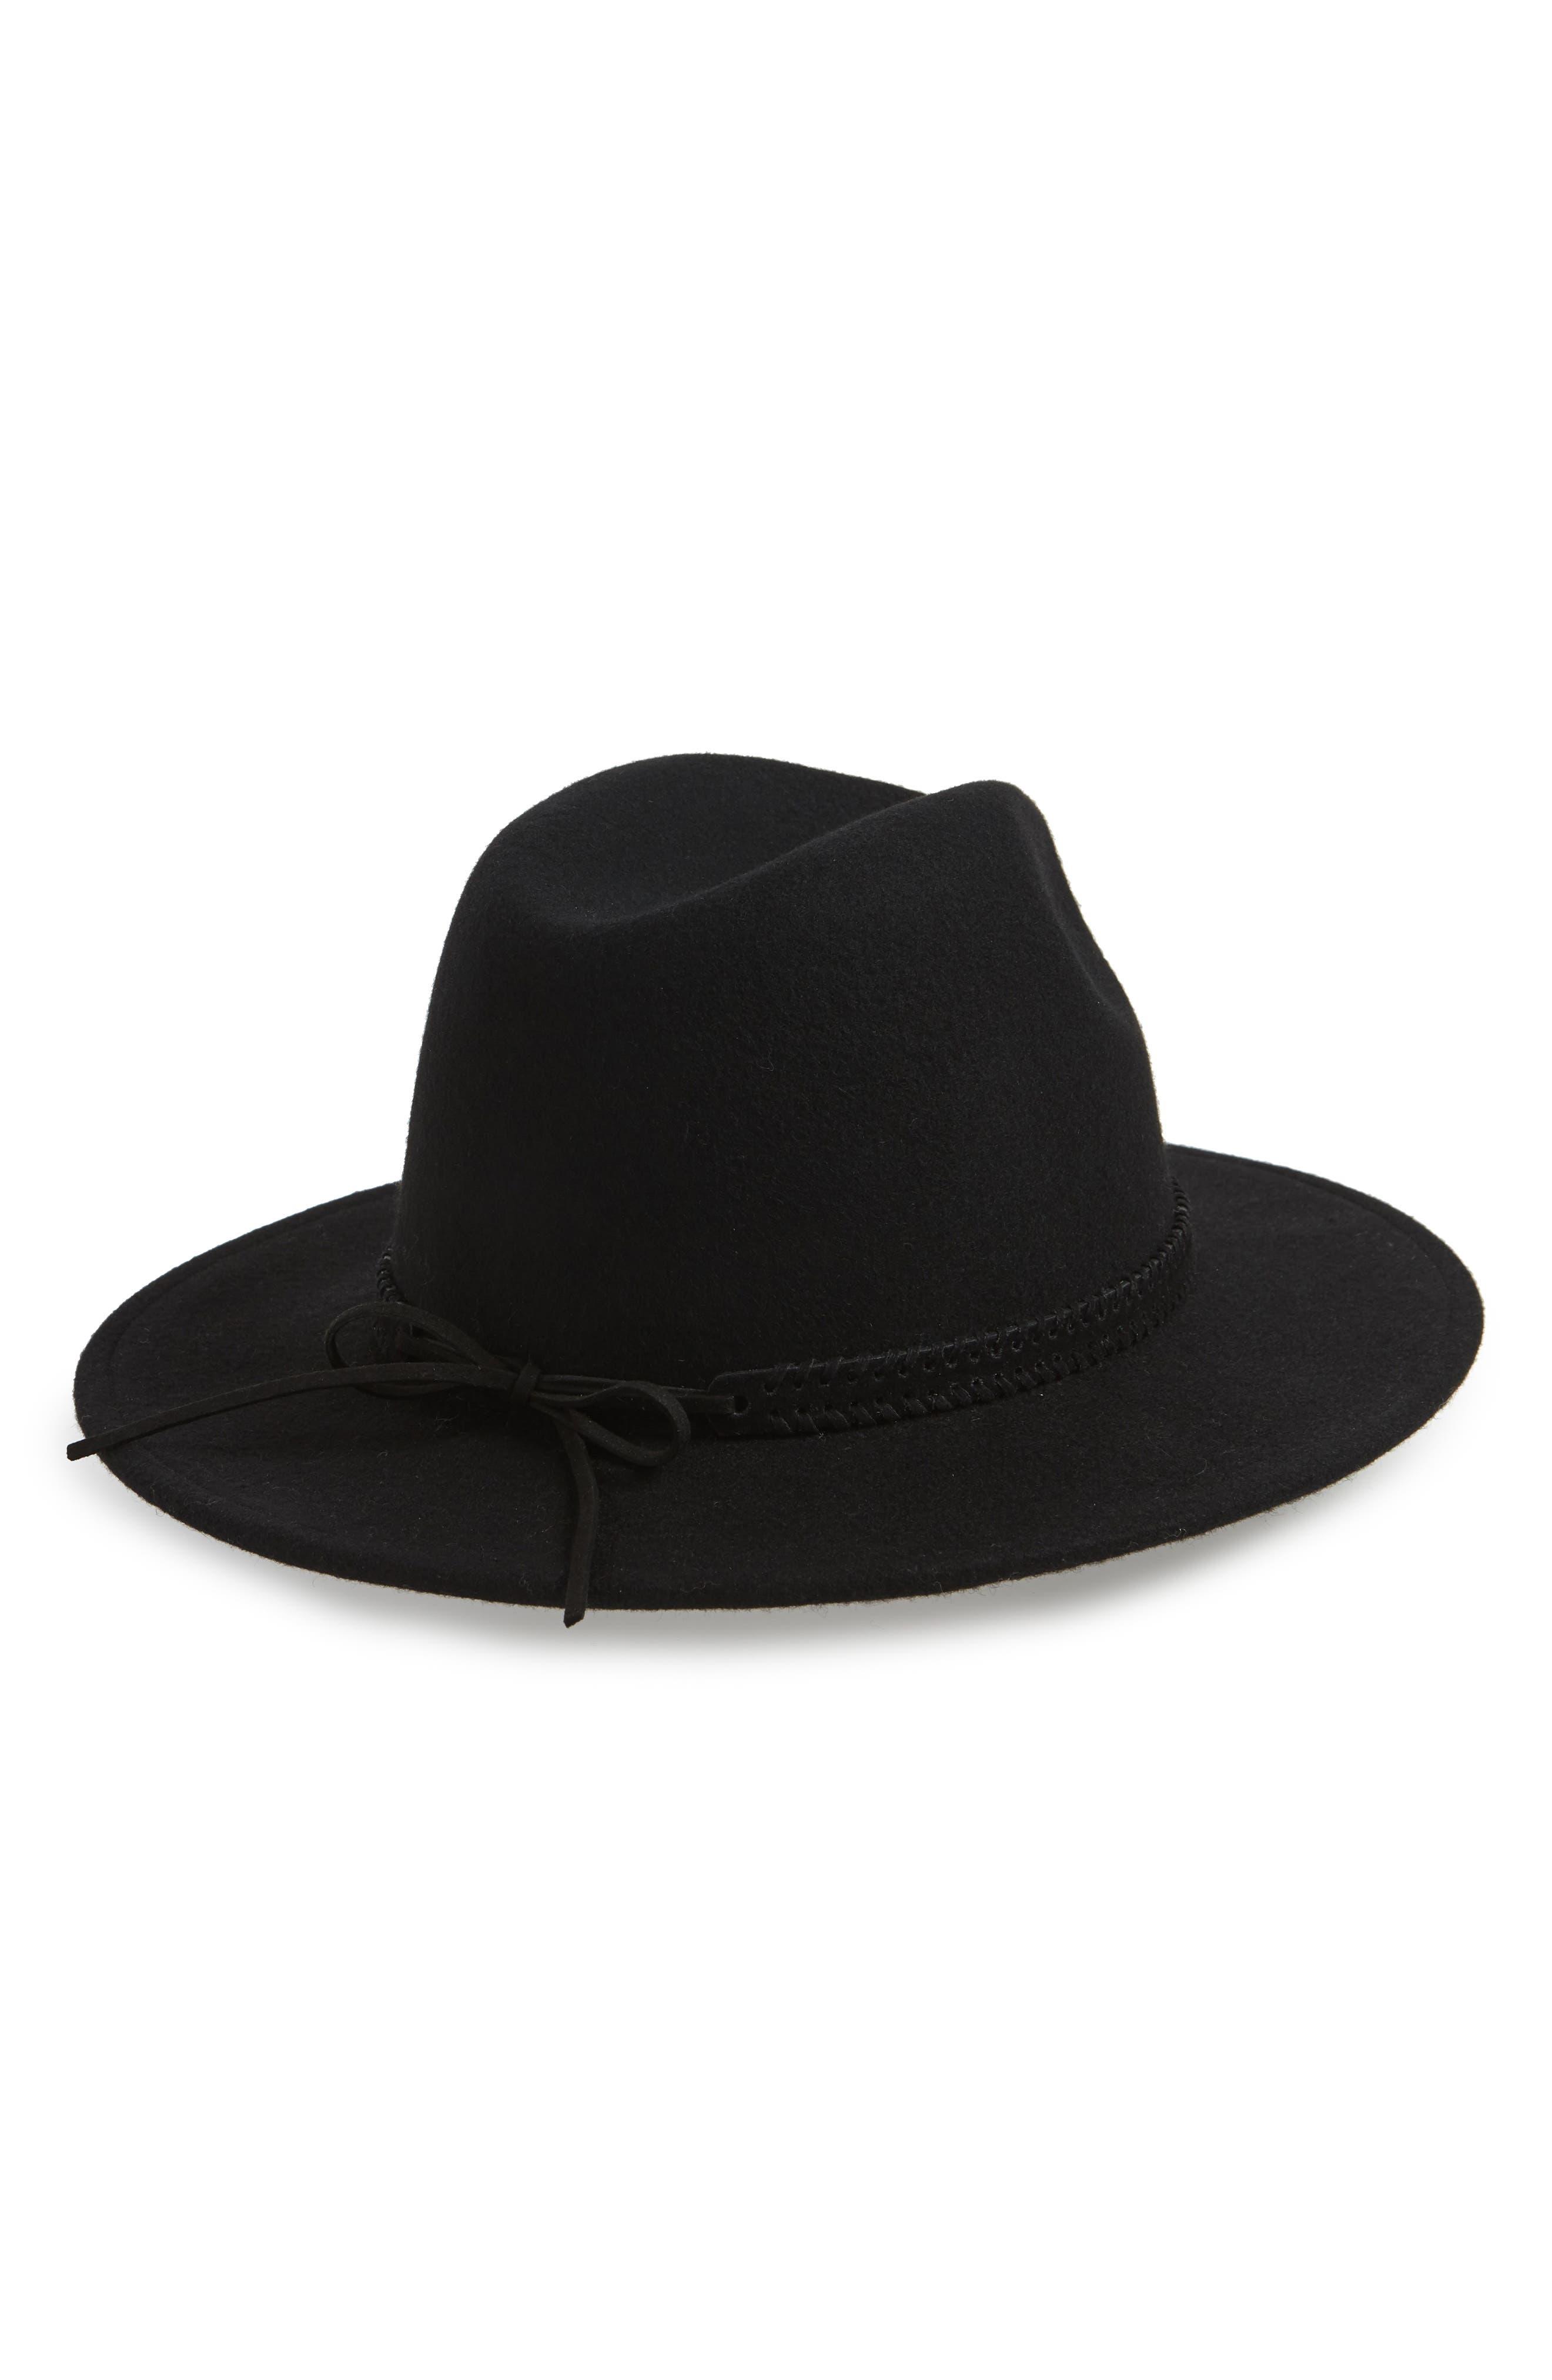 TREASURE & BOND, Felt Panama Hat, Alternate thumbnail 2, color, 010